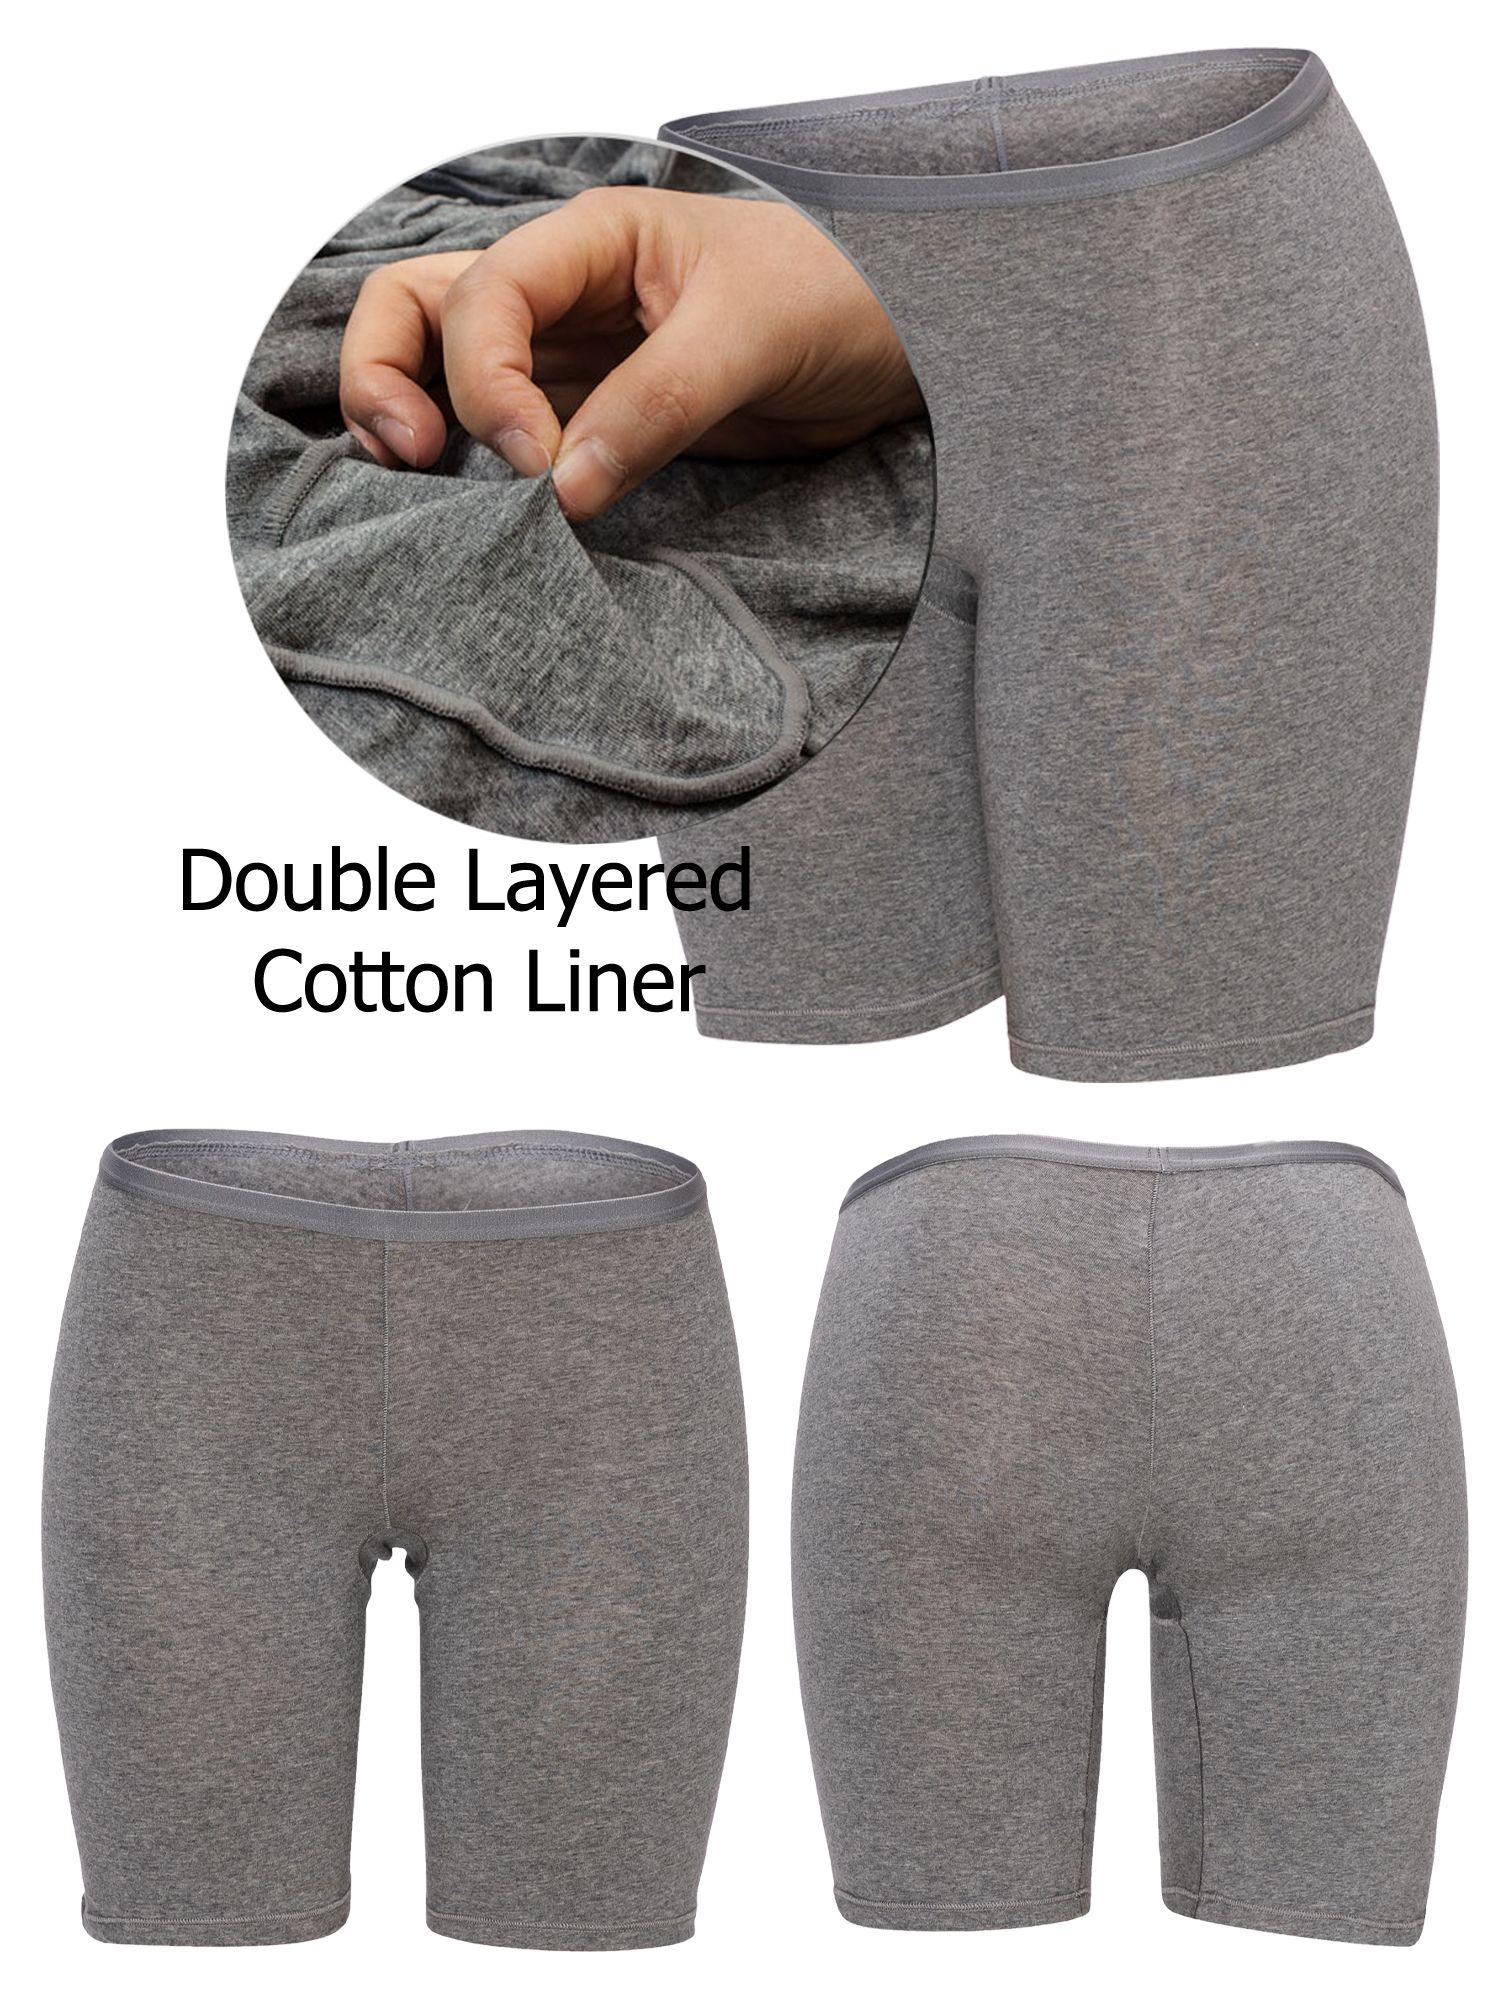 B2BODY Womens Regular /& Plus Size Stretch Cotton Long Leg 6.5 Boyshort Briefs